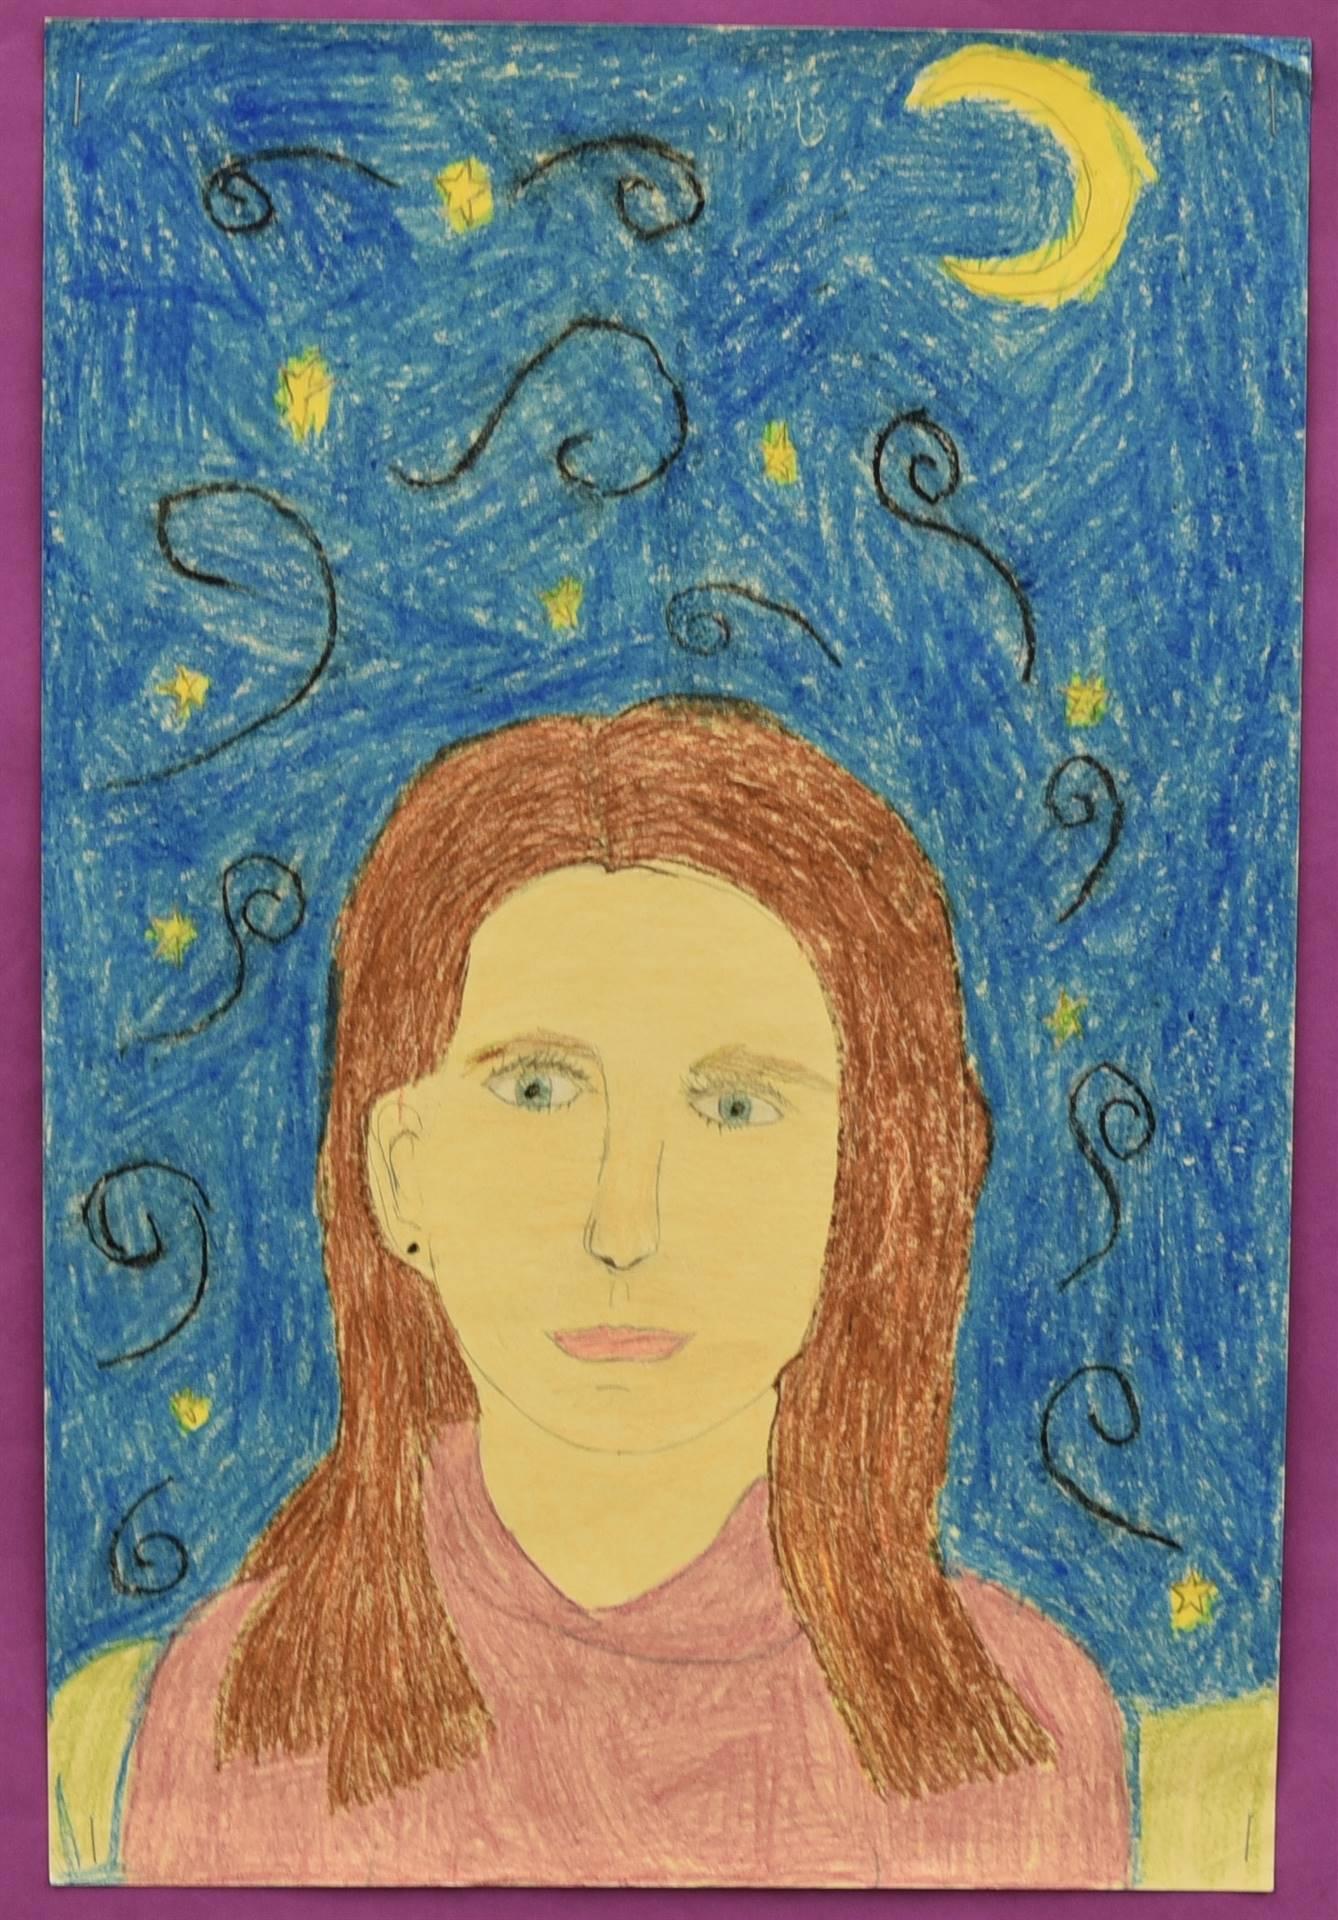 Brecksville-Broadview Hts. Middle School Art Projects 191